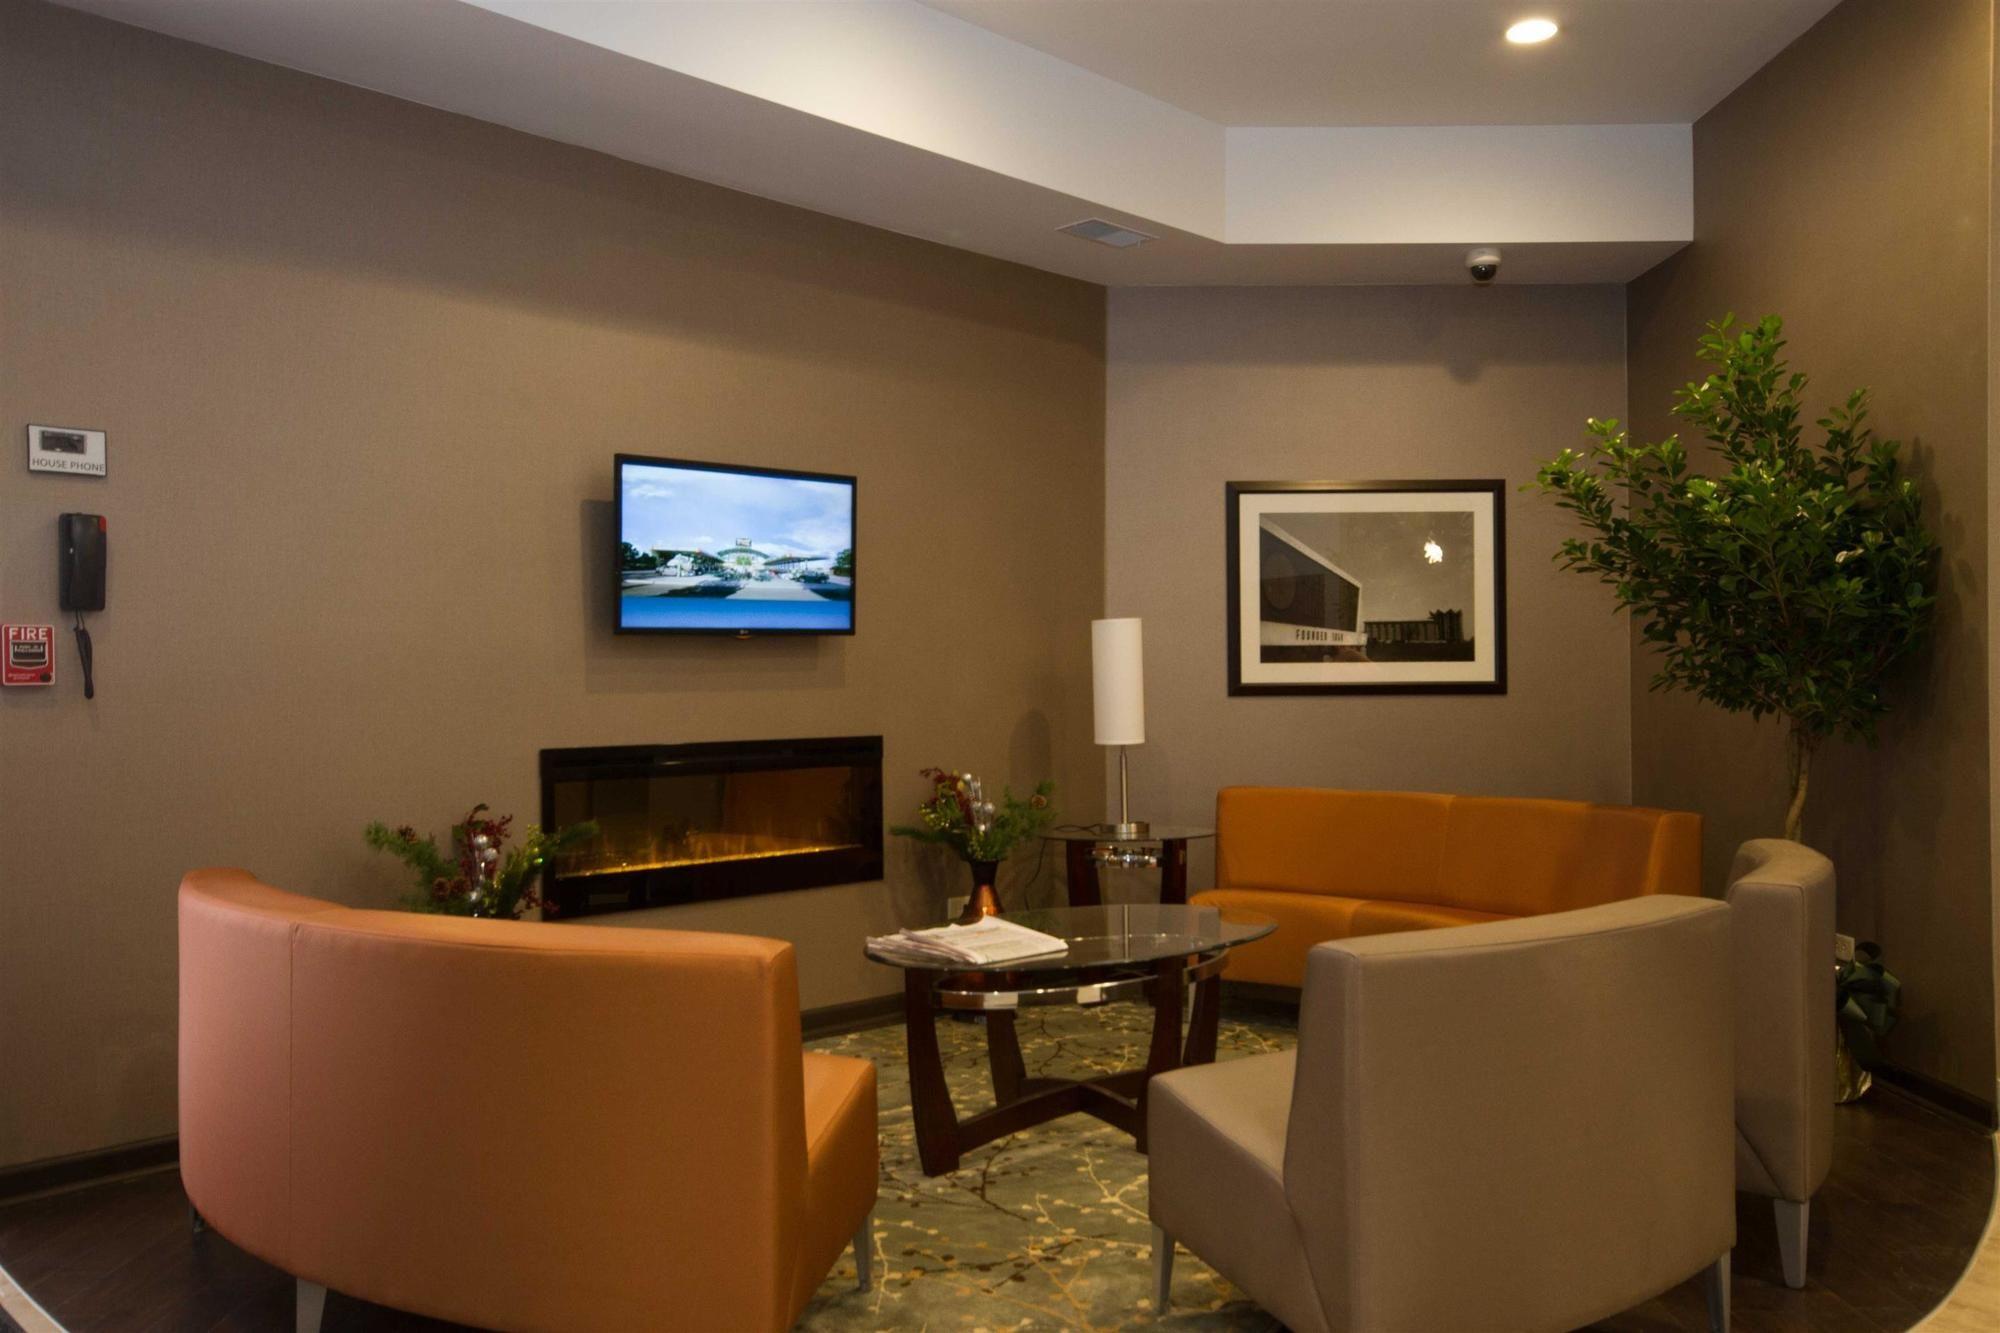 valparaiso hotel coupons for valparaiso indiana. Black Bedroom Furniture Sets. Home Design Ideas